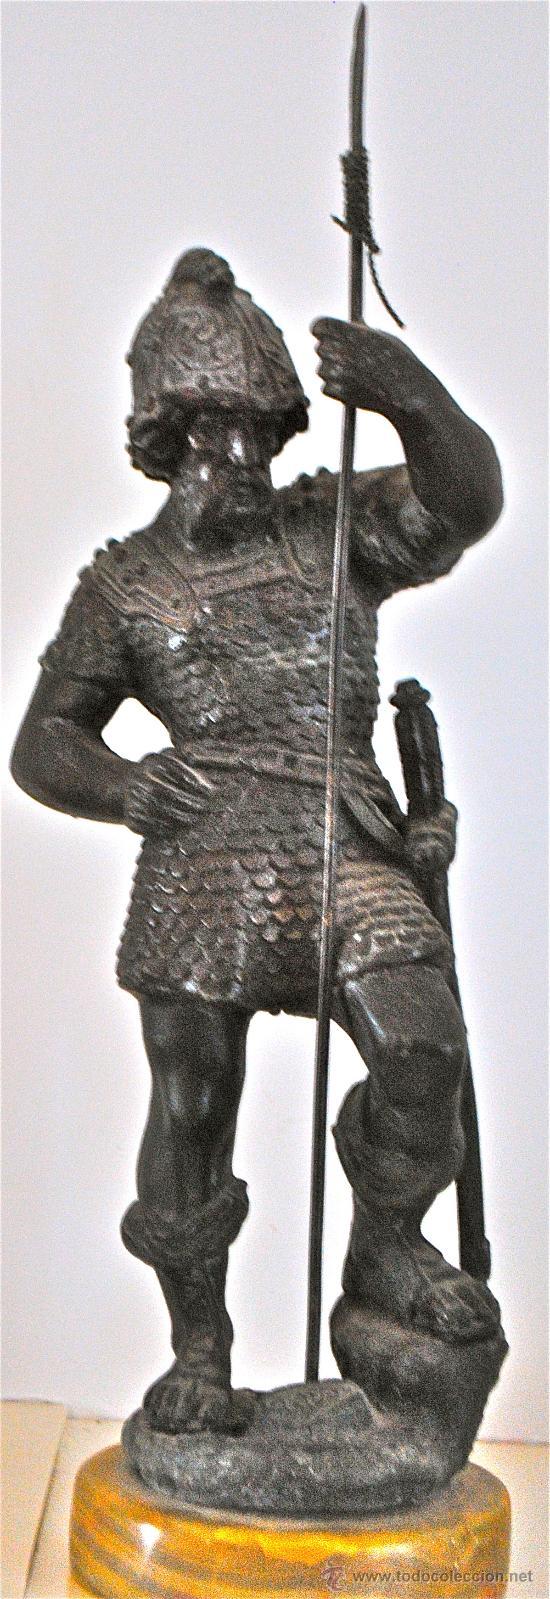 ESTATUA DE CALAMINA. GUERRERO HISPANO. SOLDADO. HISPANIA. GUERRA. 33CM. INFANTERIA ESPAÑOLA. (Arte - Escultura - Bronce)